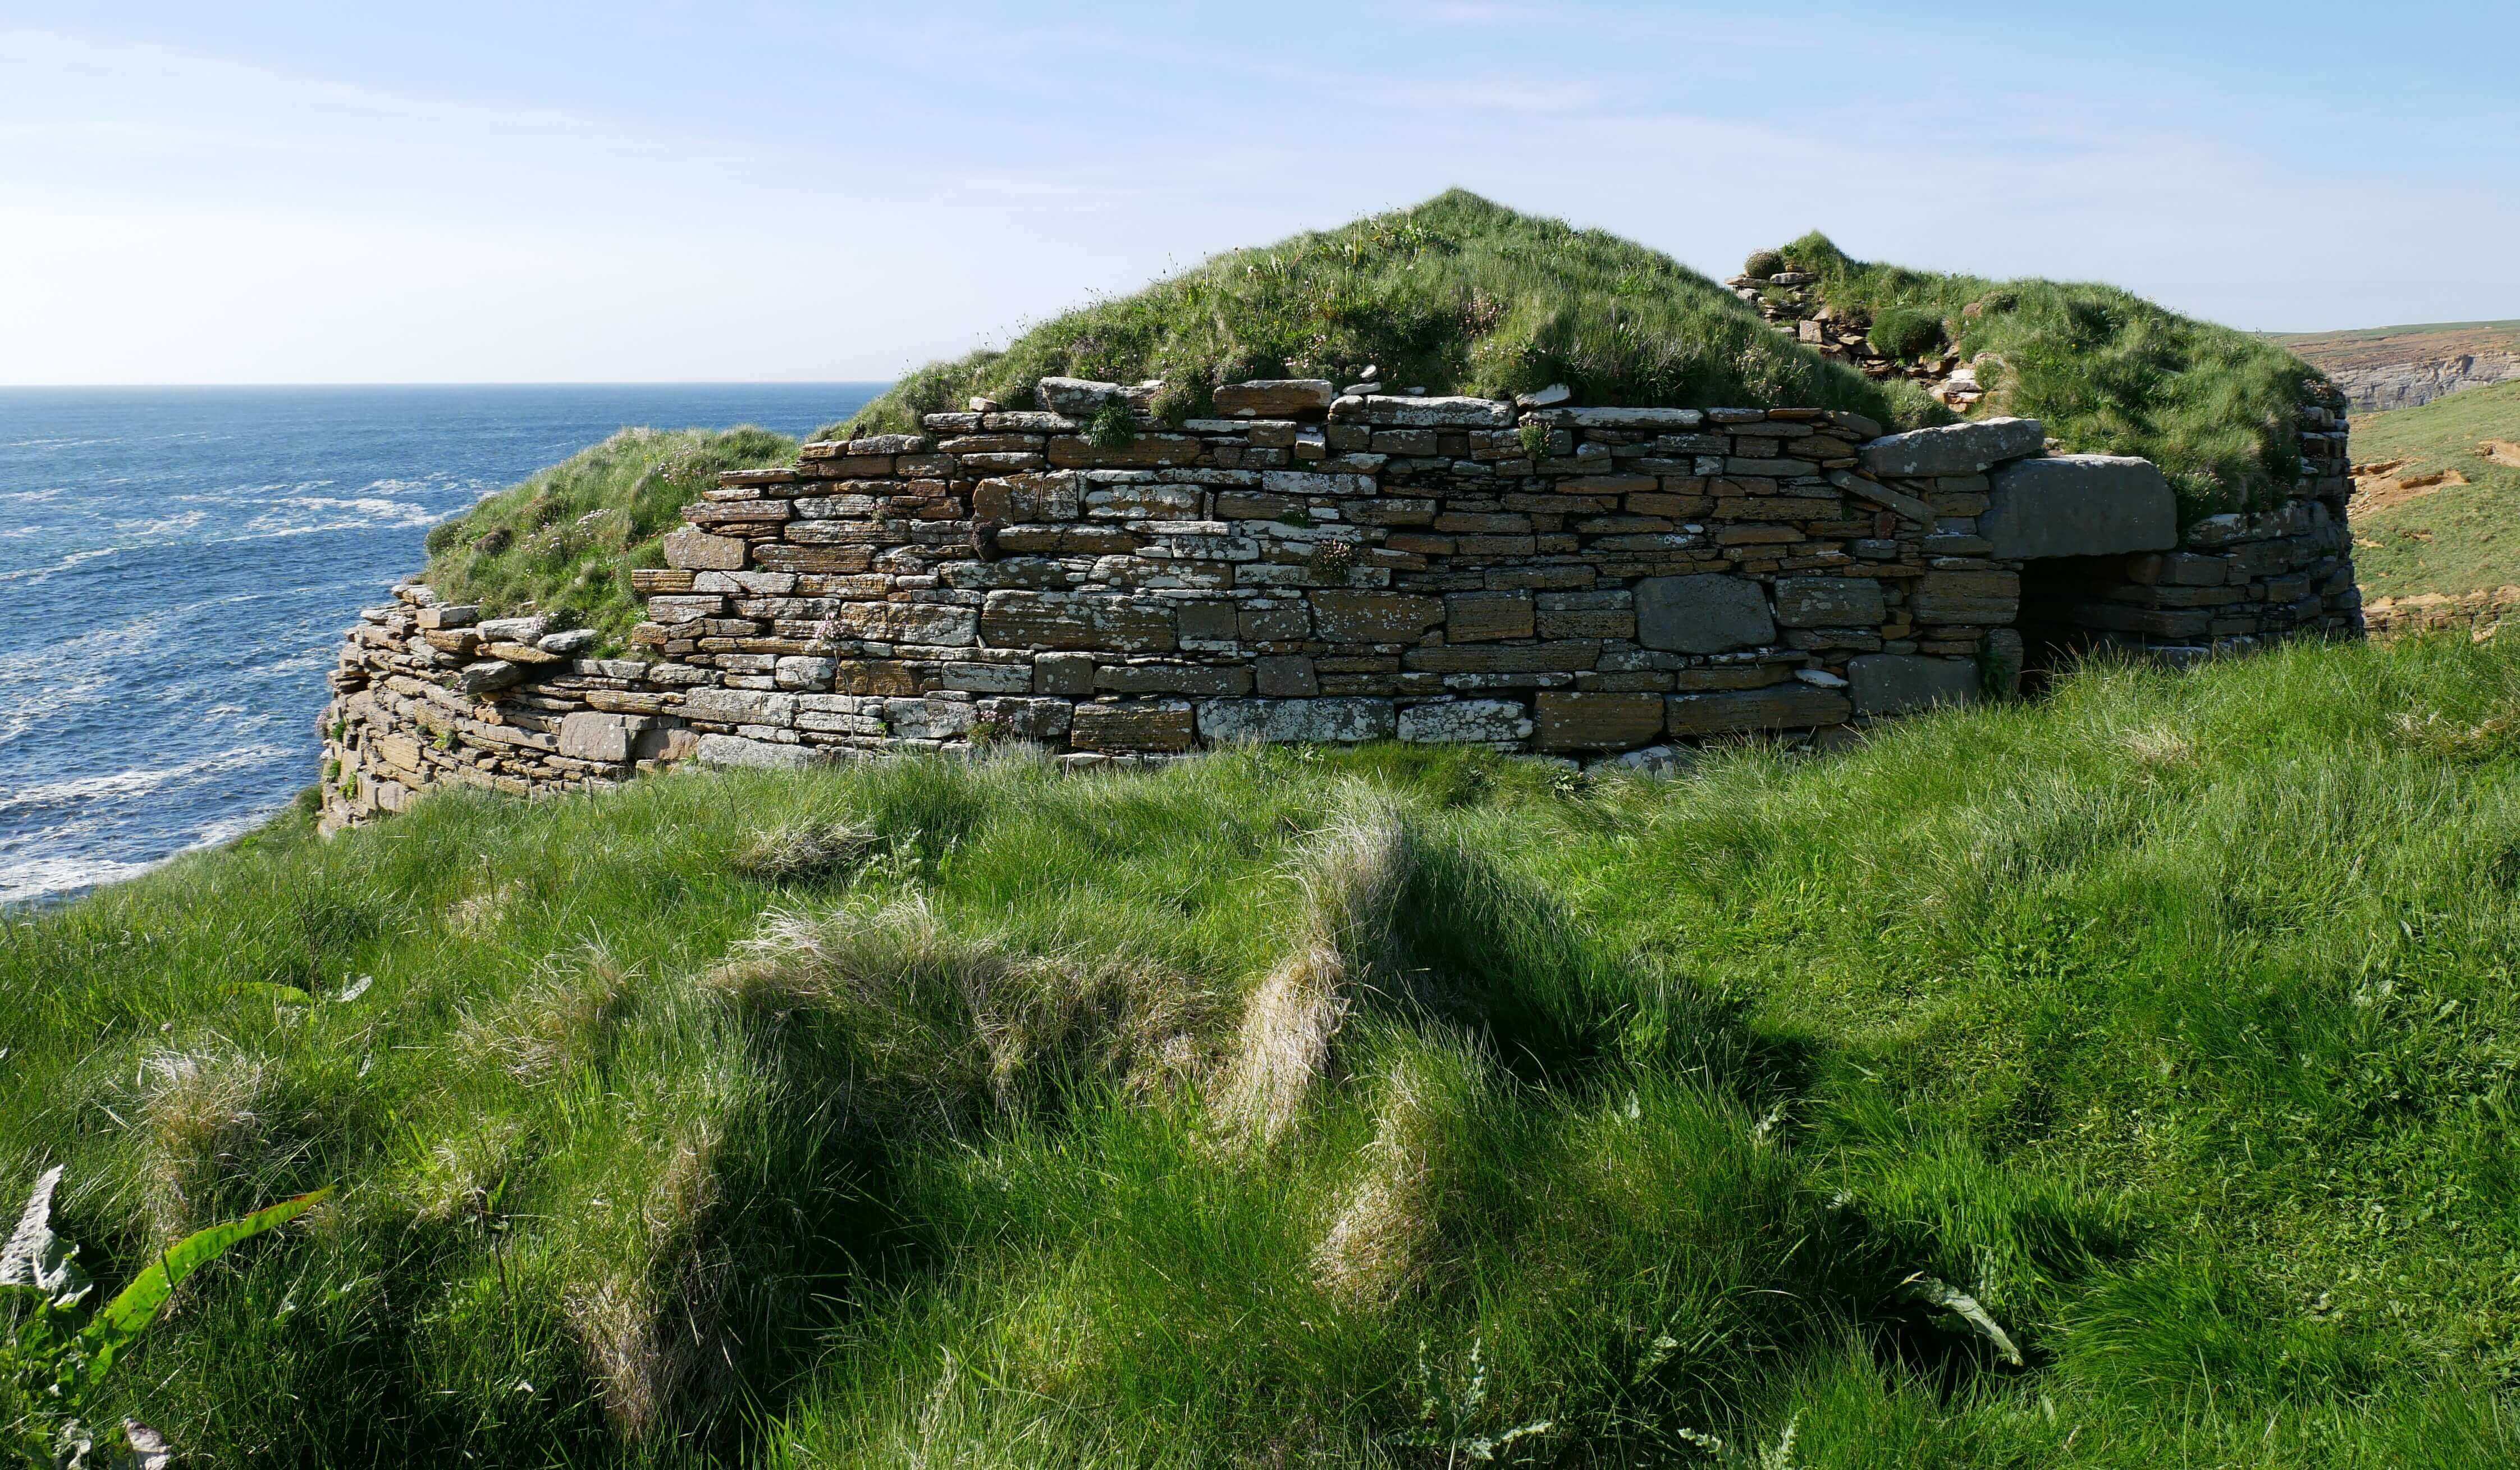 Iron age broch - Broch of Borwick, Yesnaby, Orkney Islands, Scotland